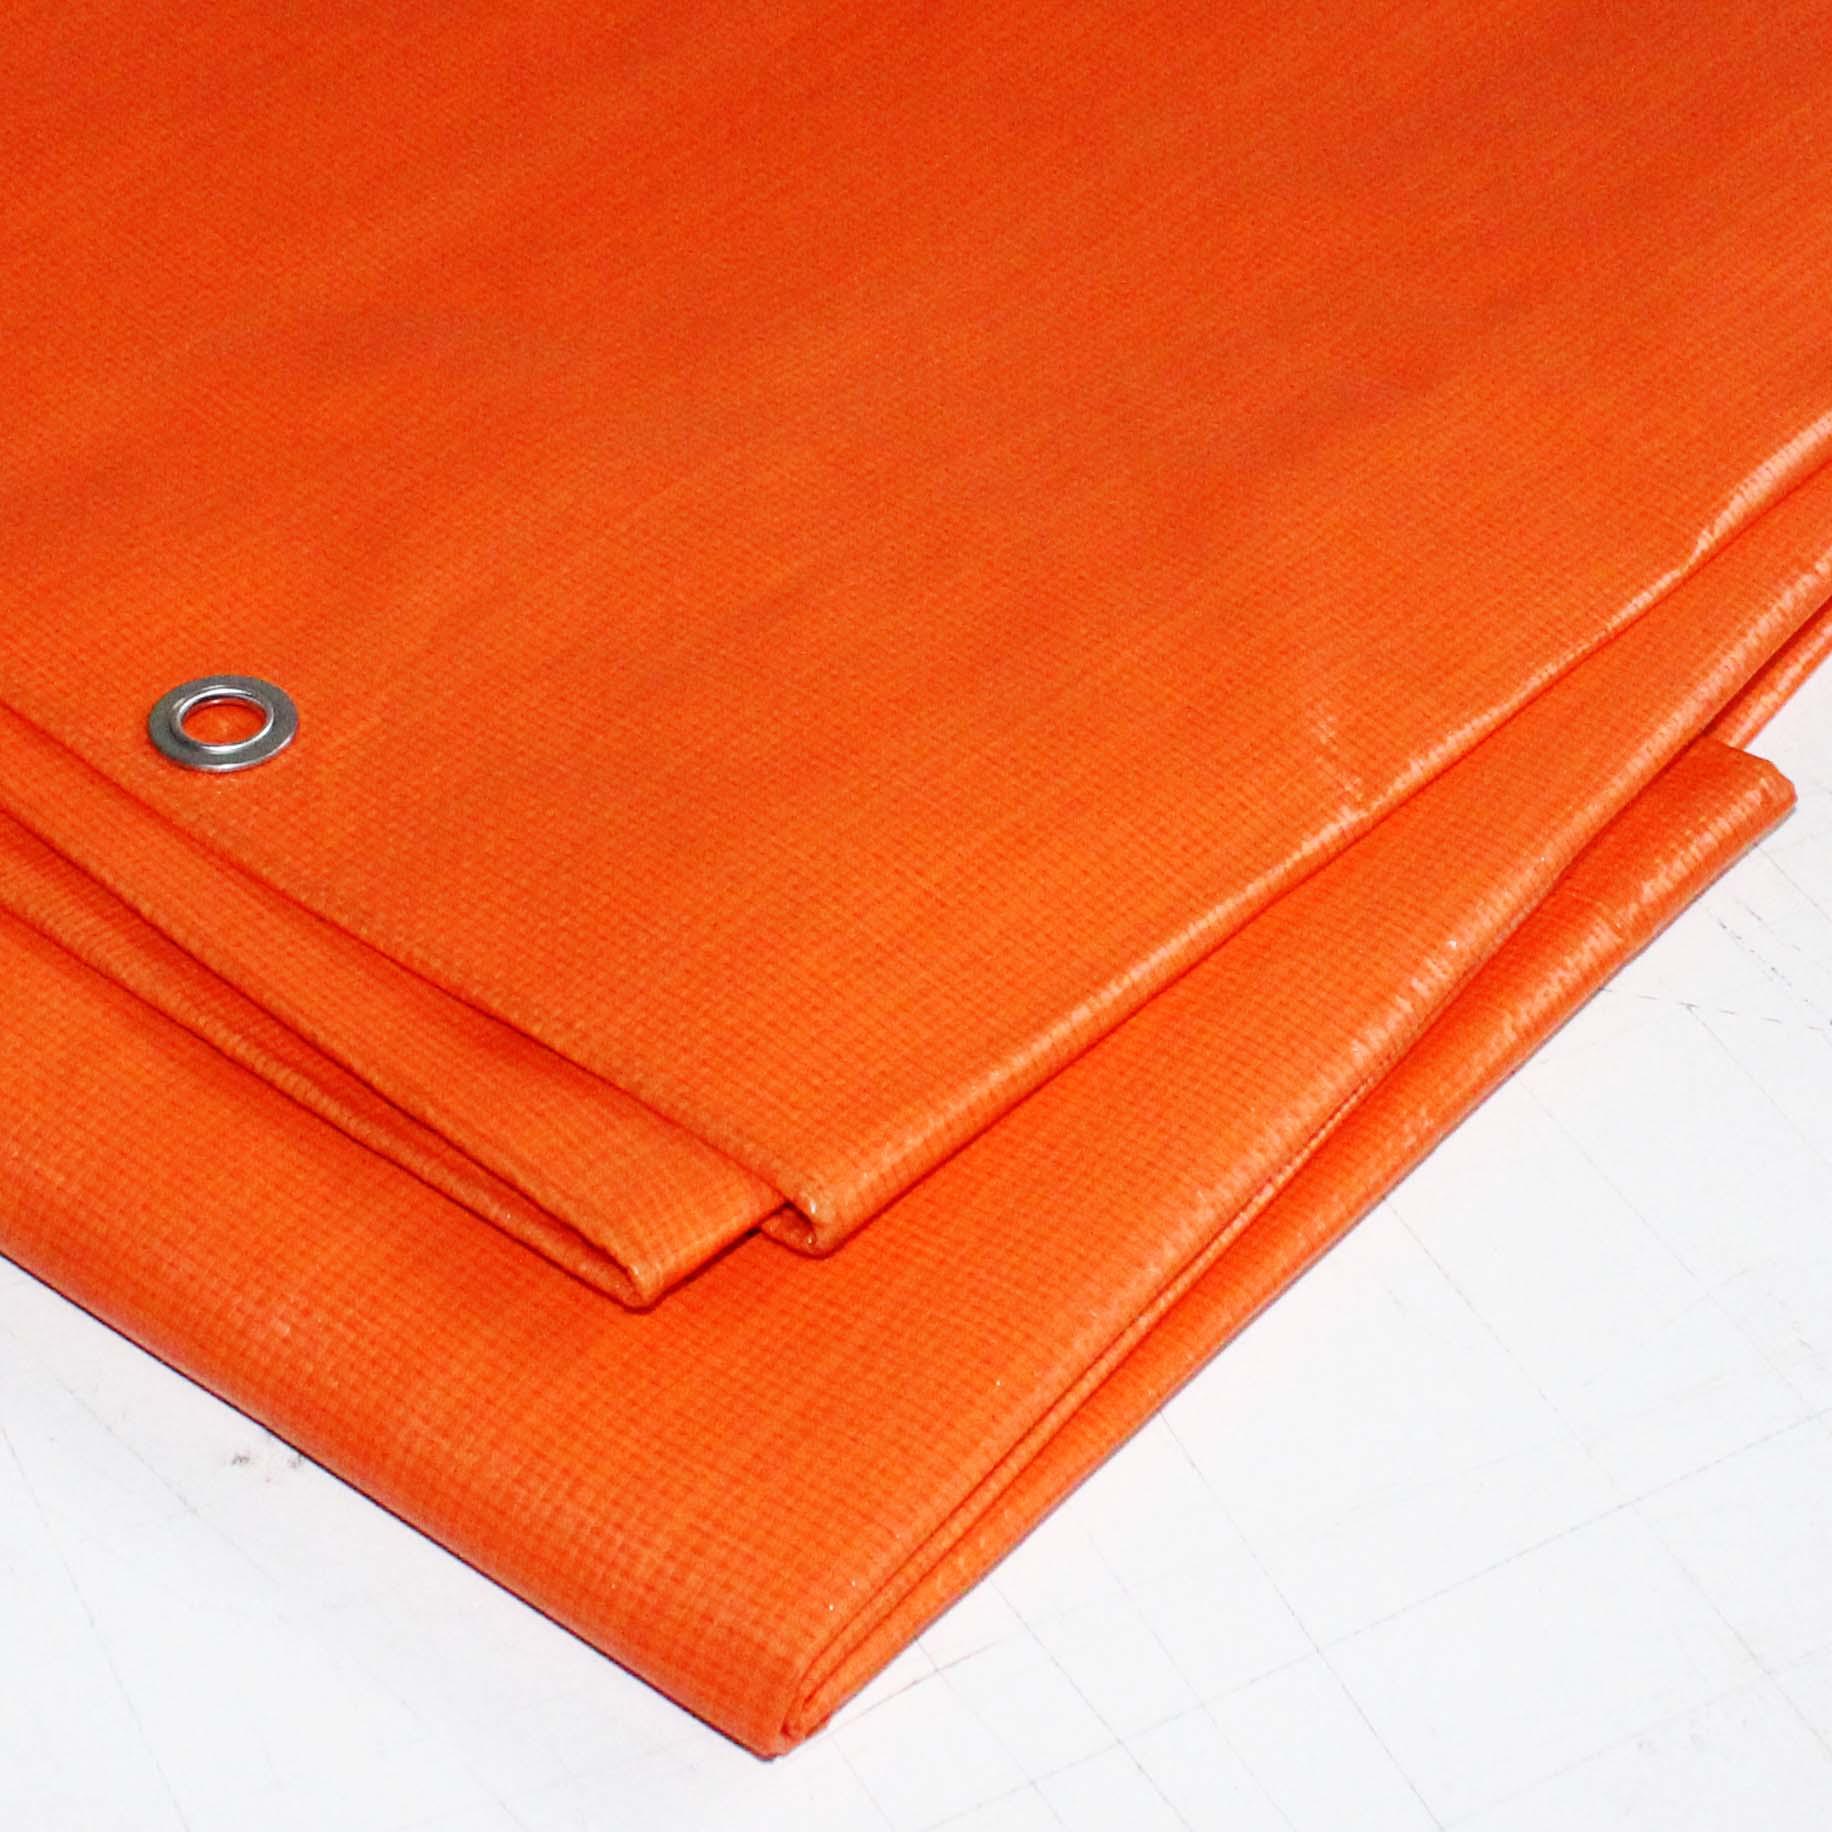 Prolona leve agric laranja 2x3m